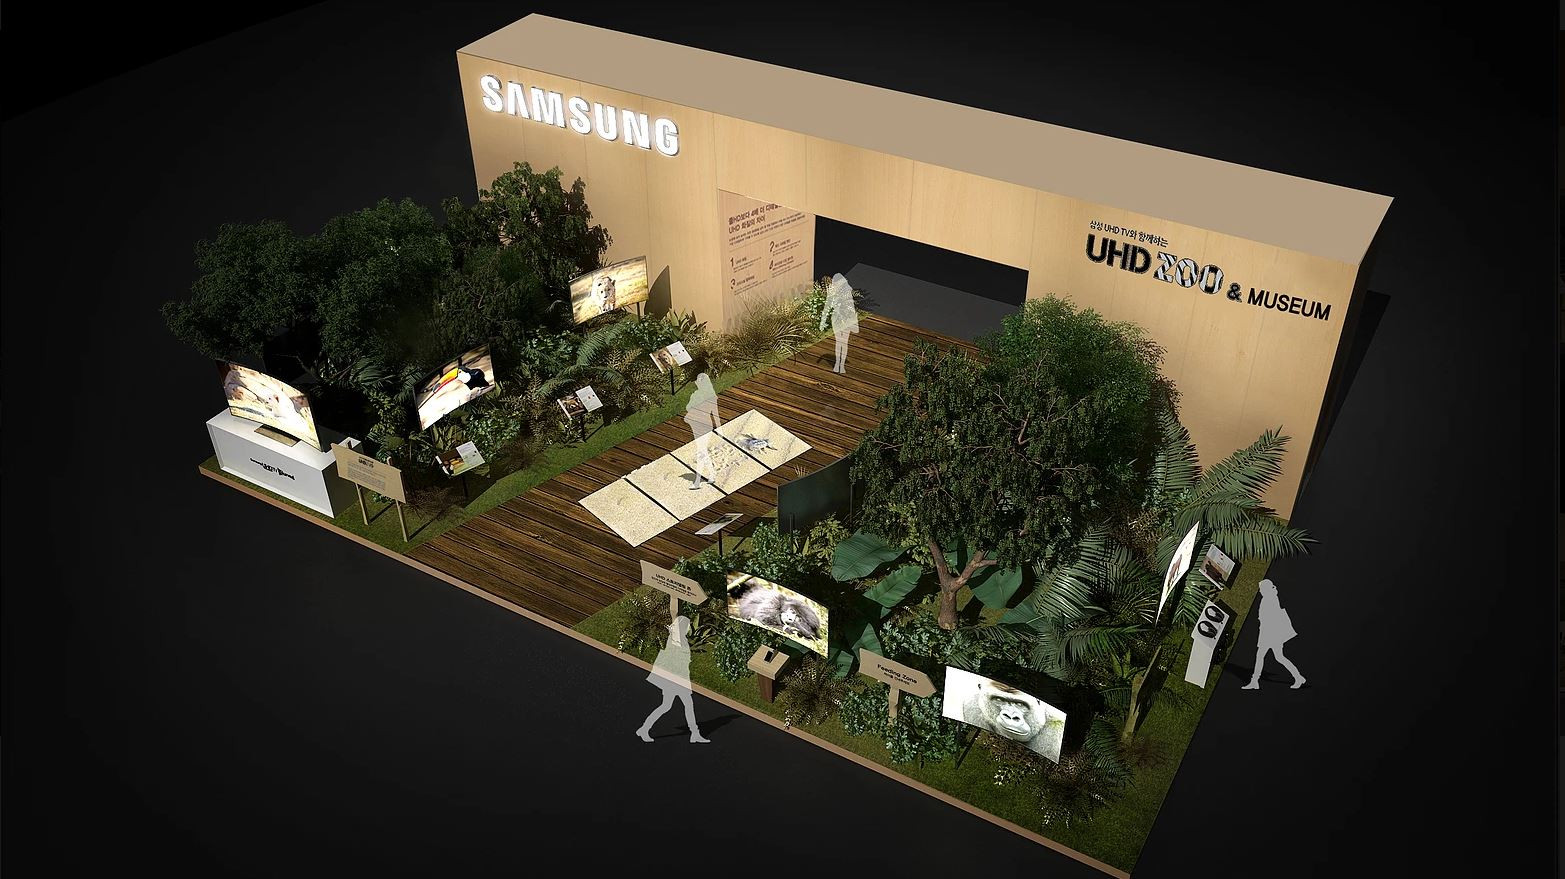 SAMSUNG UHD ZOO & MUSEUM